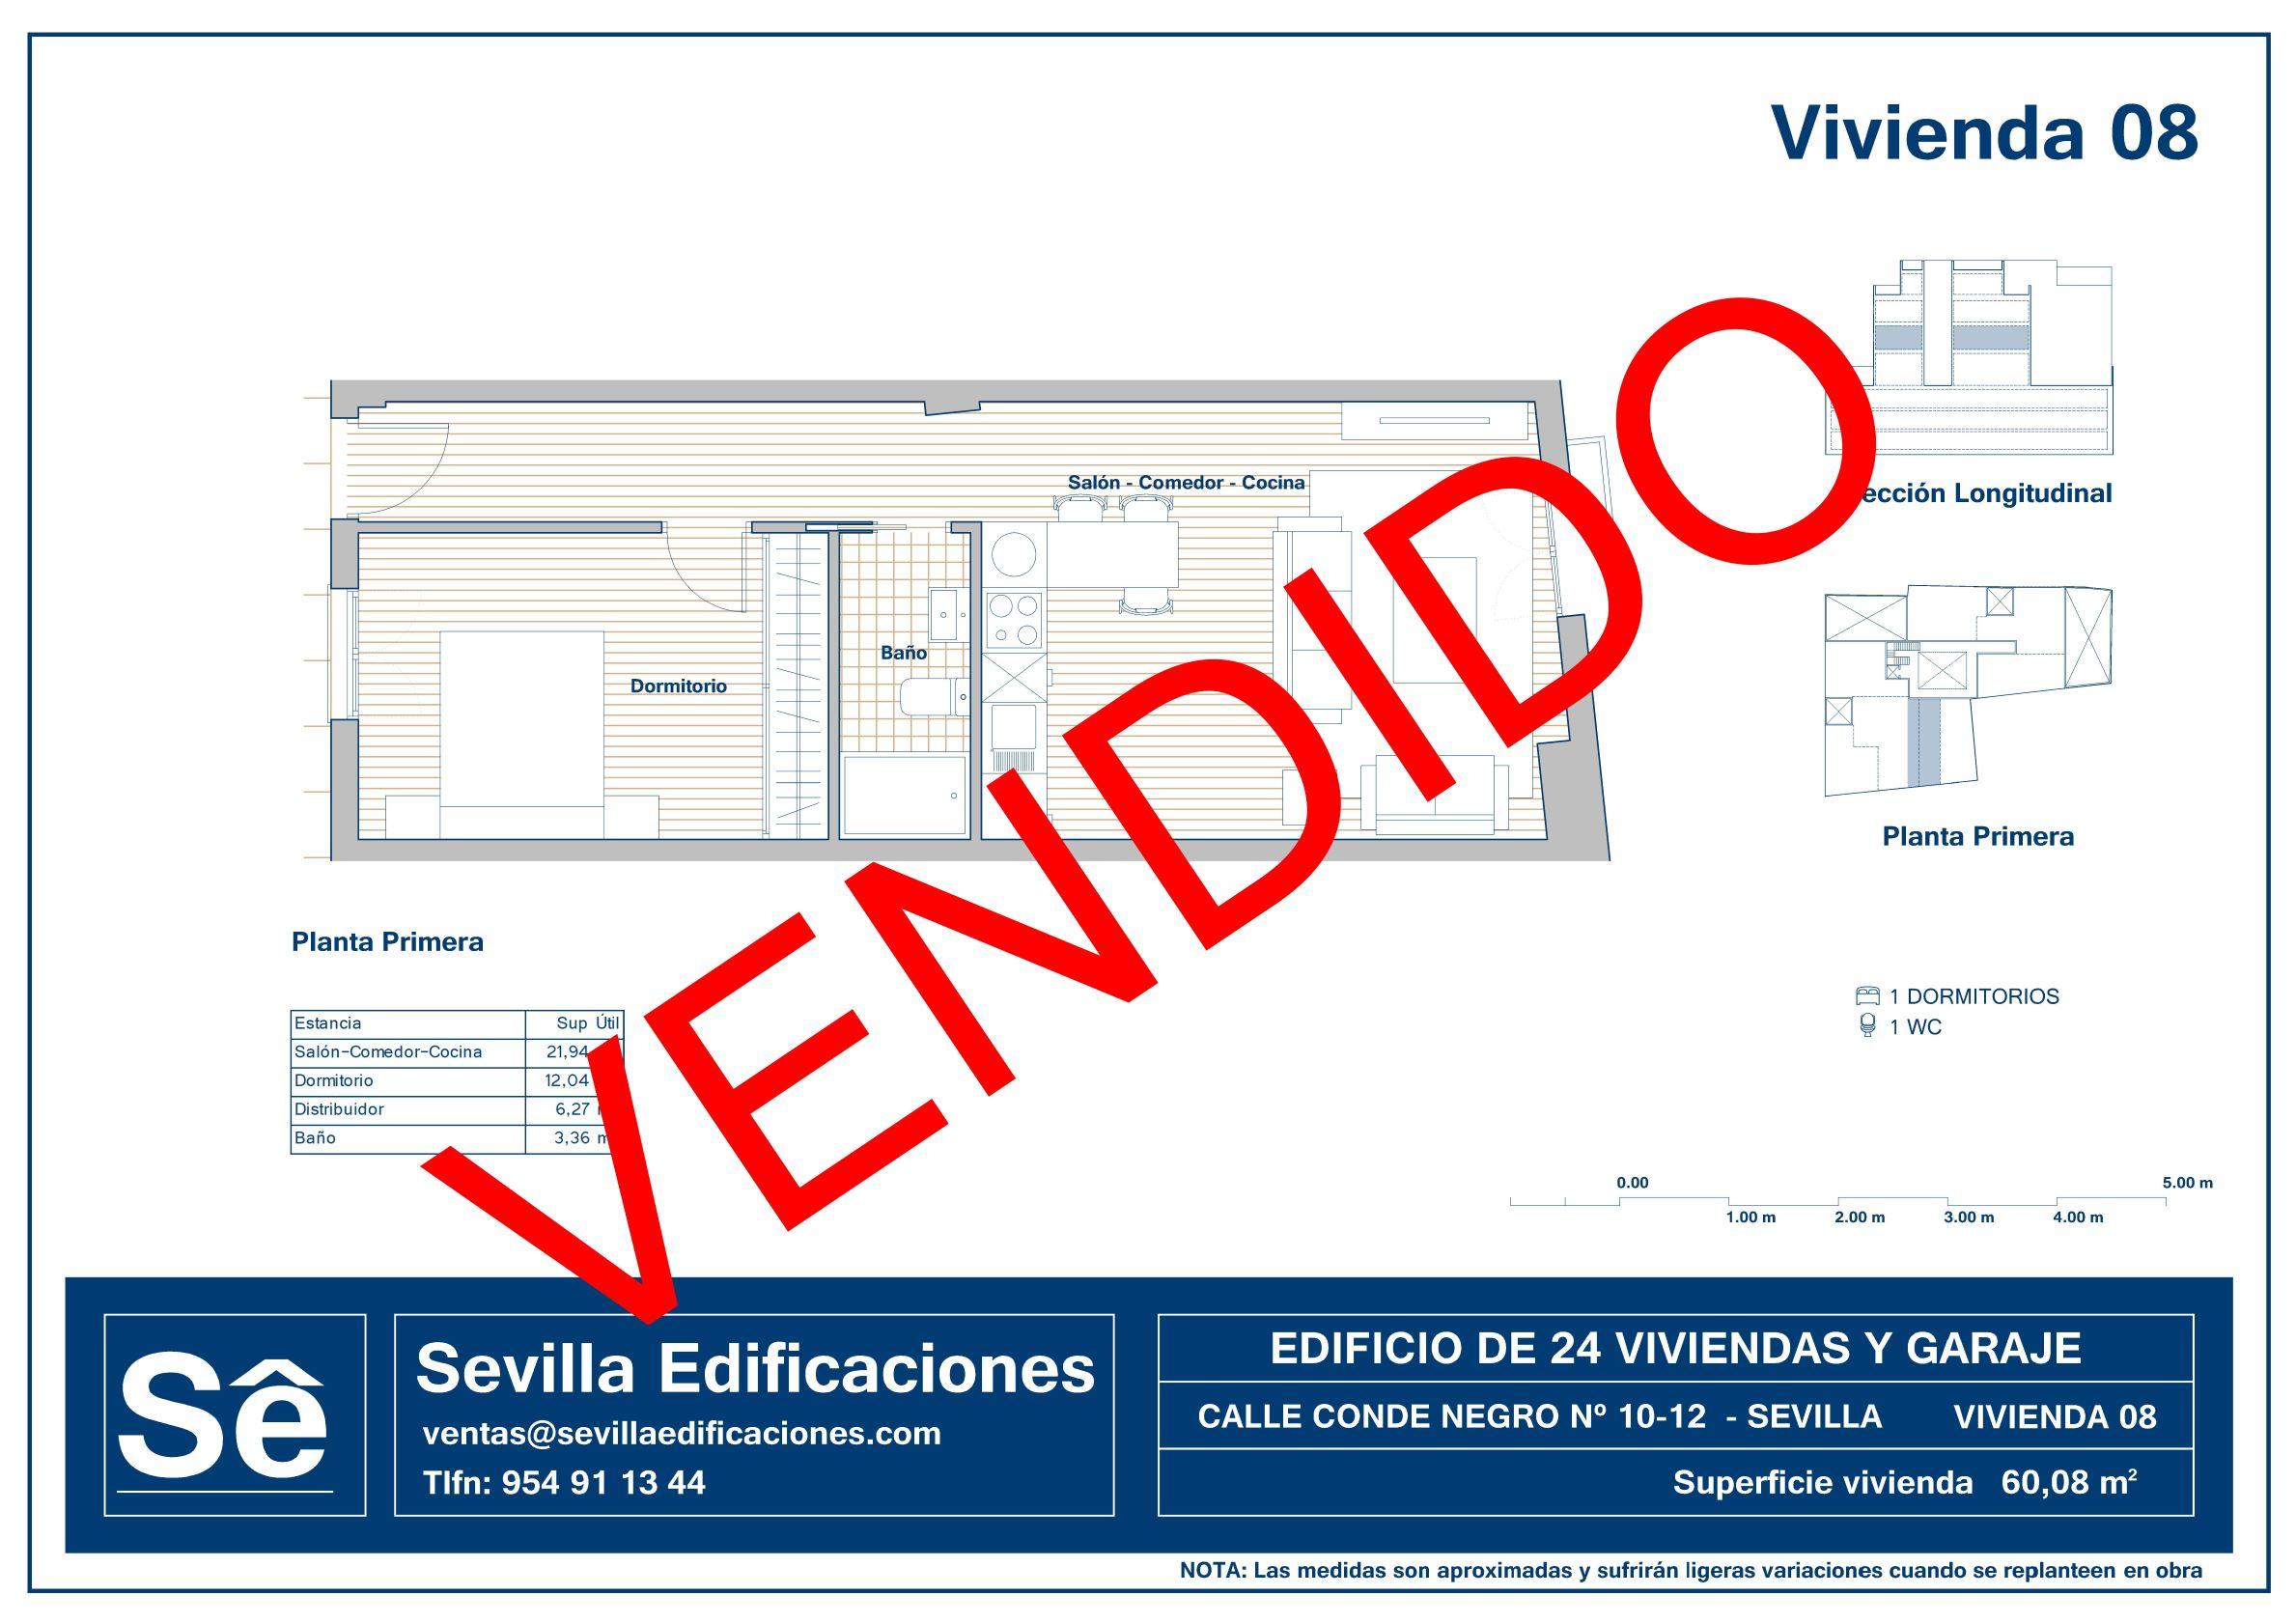 CONDENEGRO_VIVIENDA_08_VENDIDO